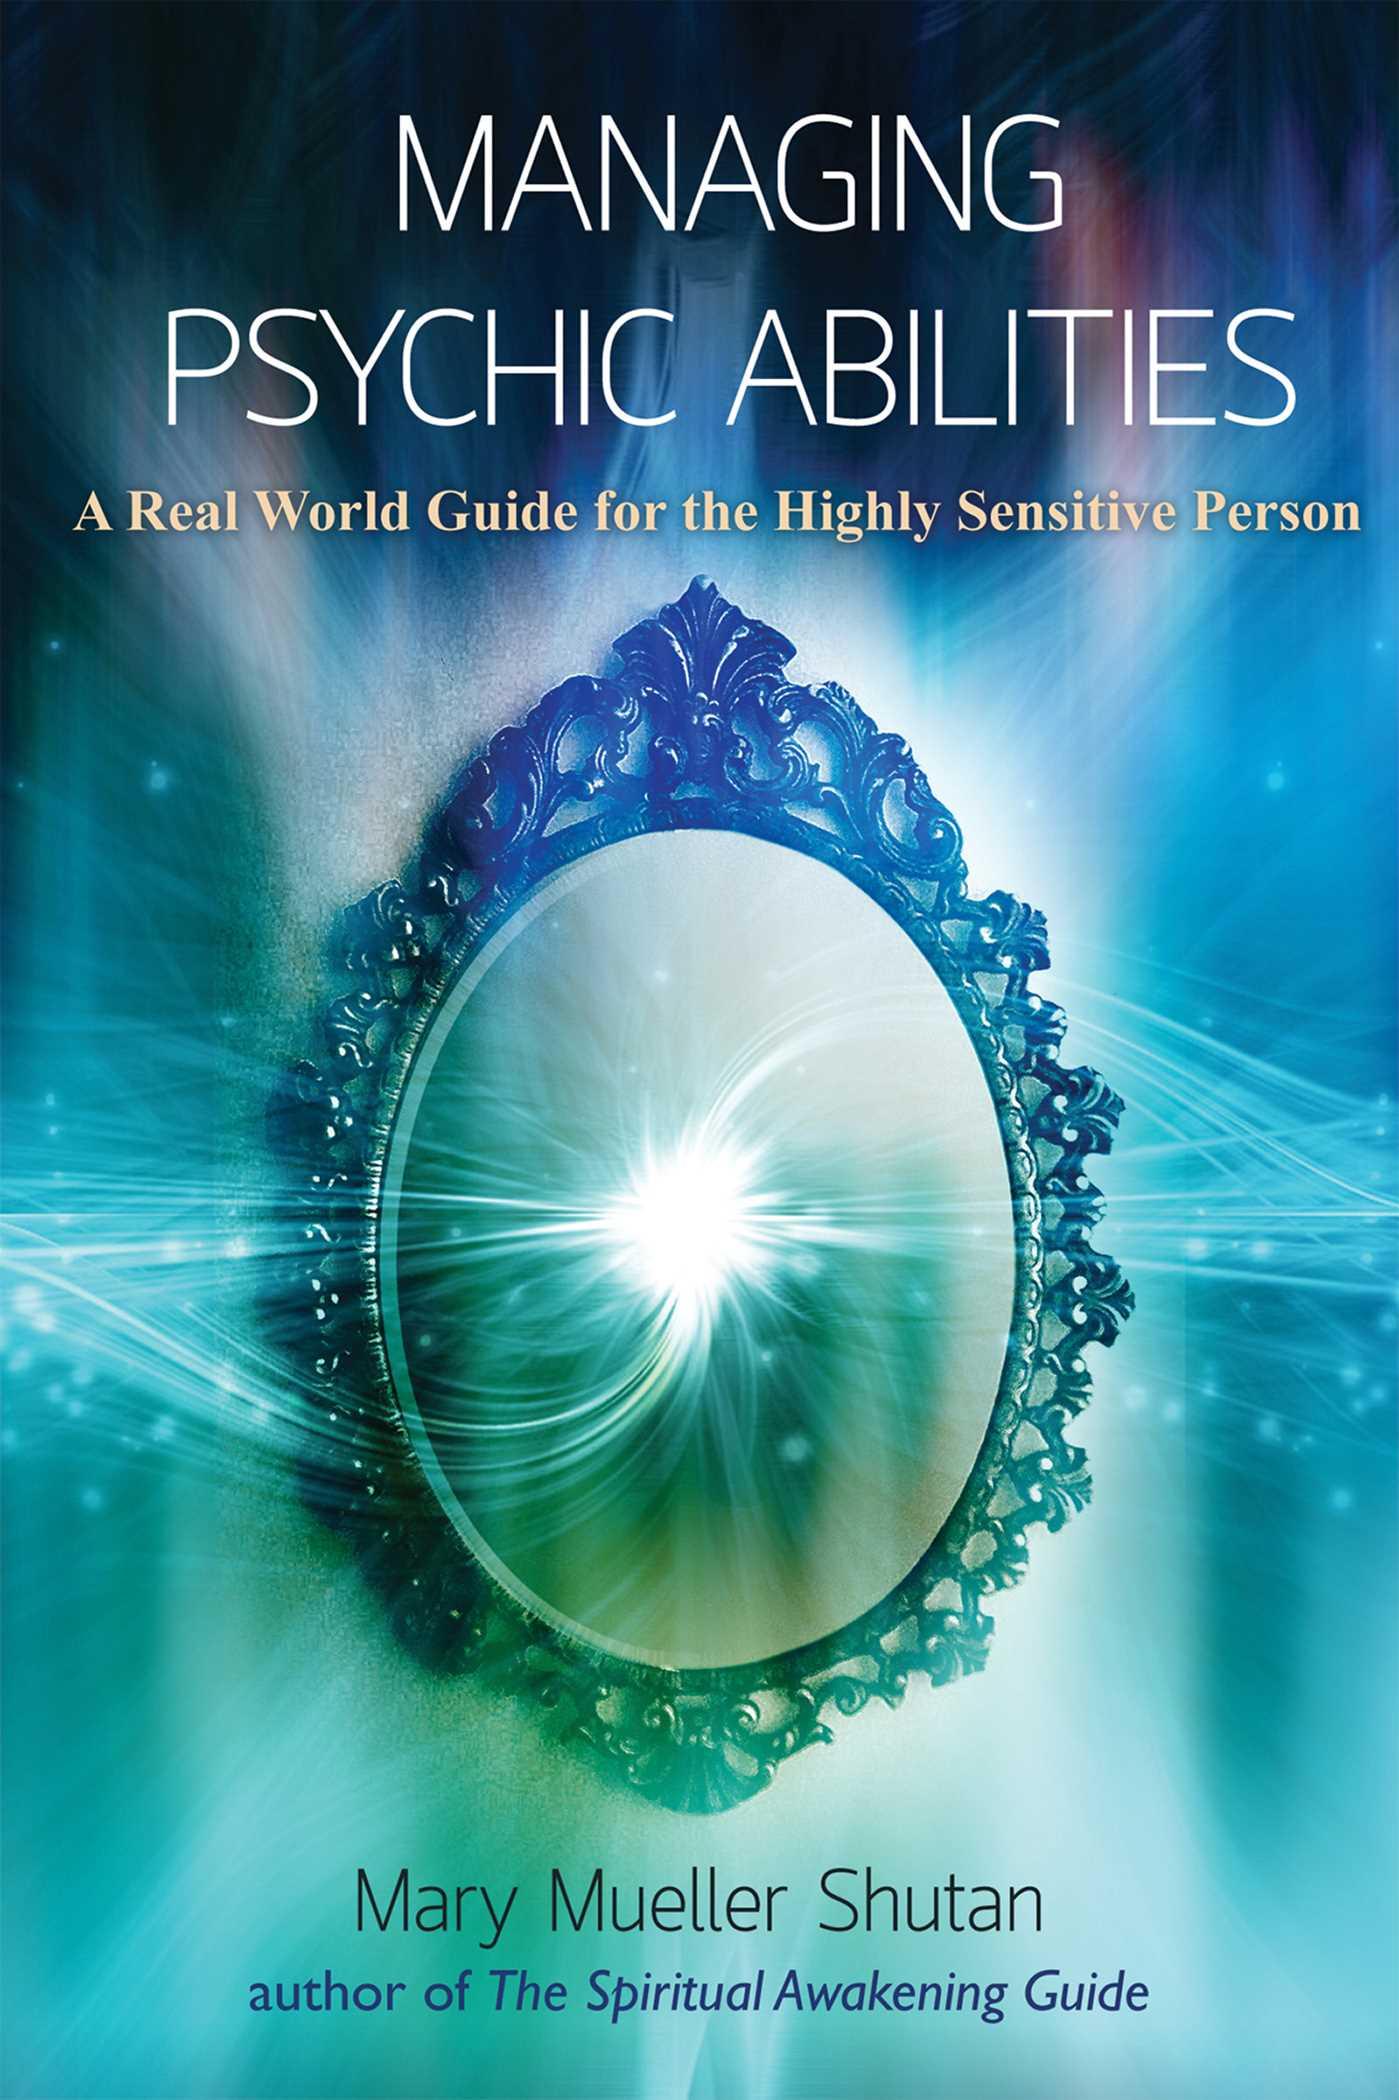 Managing Psychic Abilities   Book by Mary Mueller Shutan